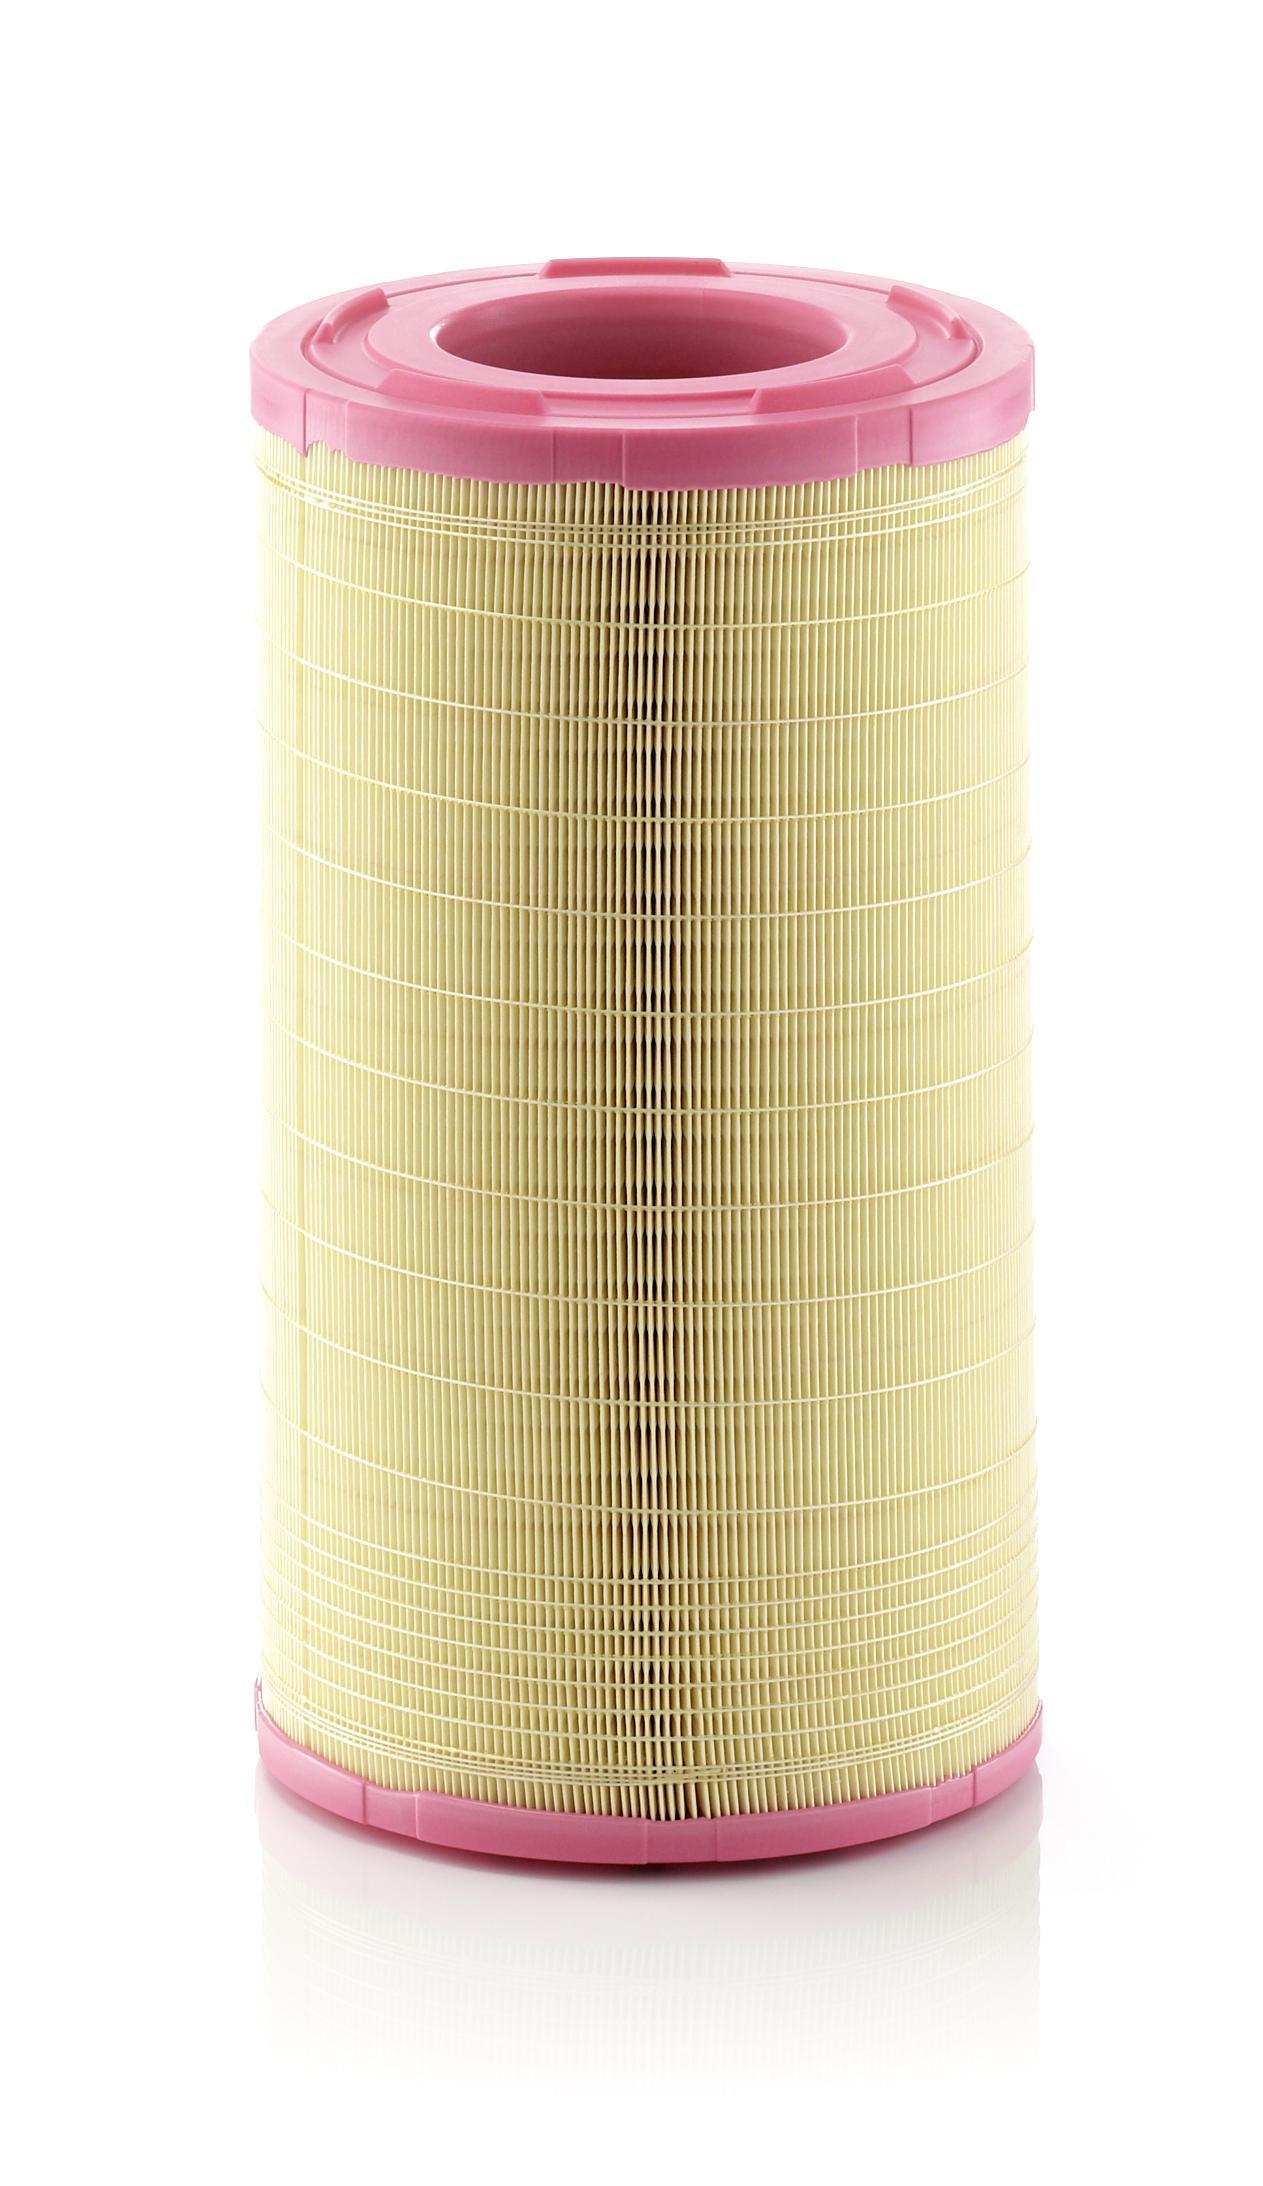 MANN-FILTER Filtr powietrza do MAN - numer produktu: C 26 1005